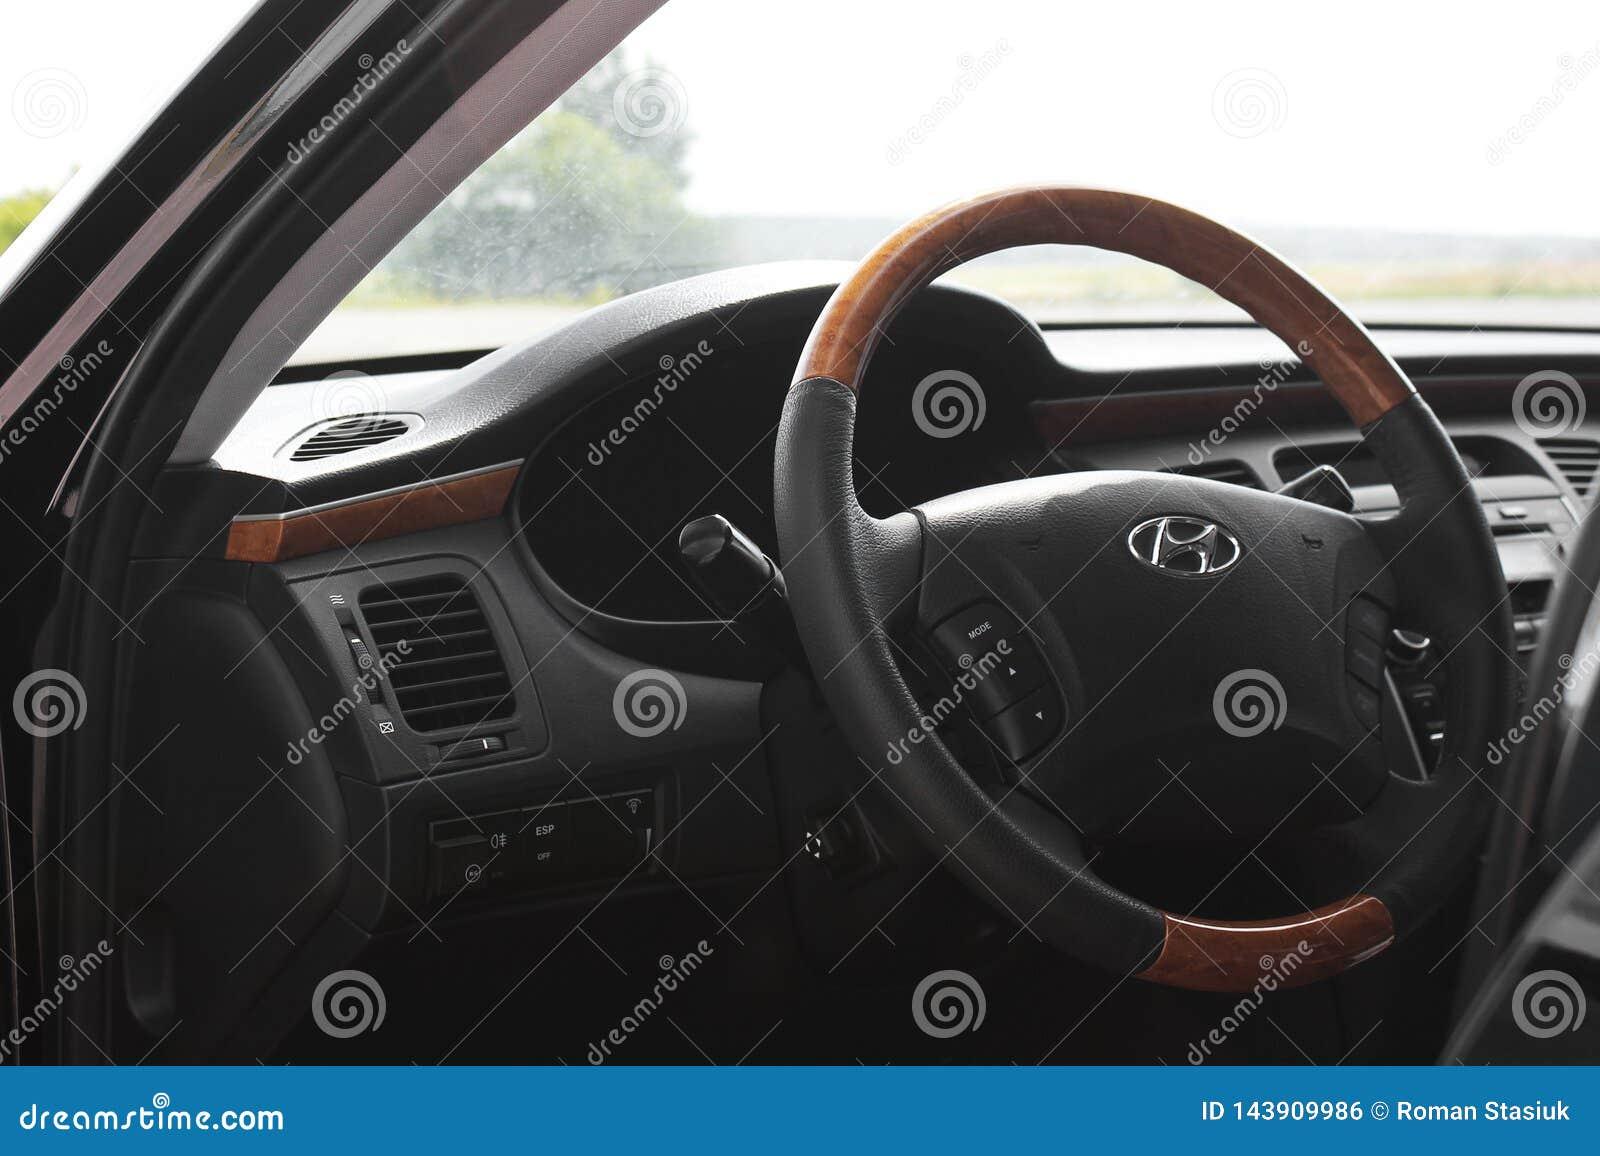 Kiev Ukraina - Augusti 6, 2018: Hyundai prakt Sikt av inre av en modern bil som visar instrumentbr?dan